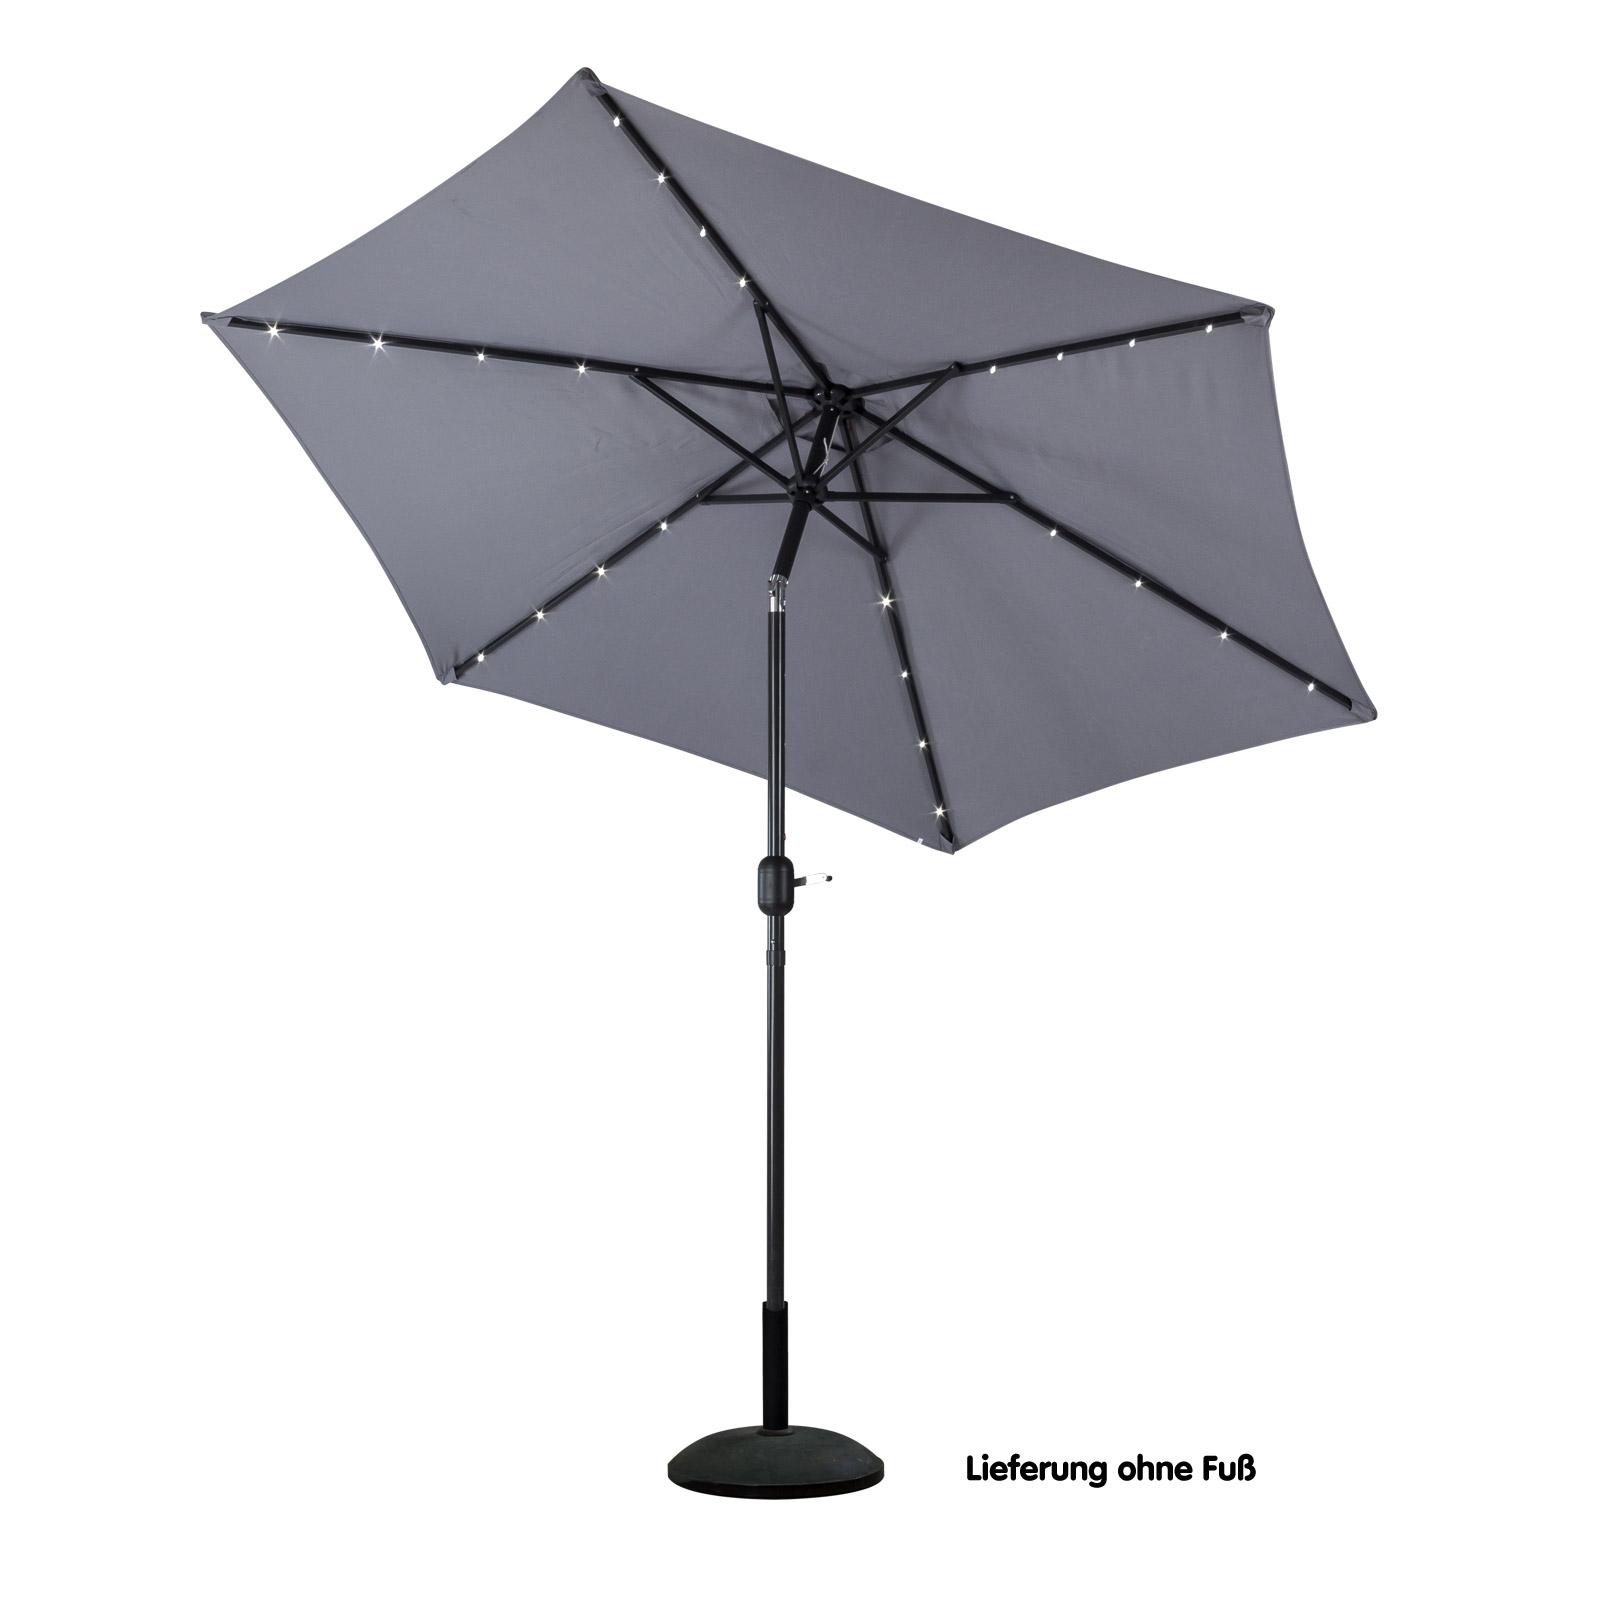 alu sonnenschirm 270cm gartenschirm solar led beleuchtung schirm anthrazit ebay. Black Bedroom Furniture Sets. Home Design Ideas